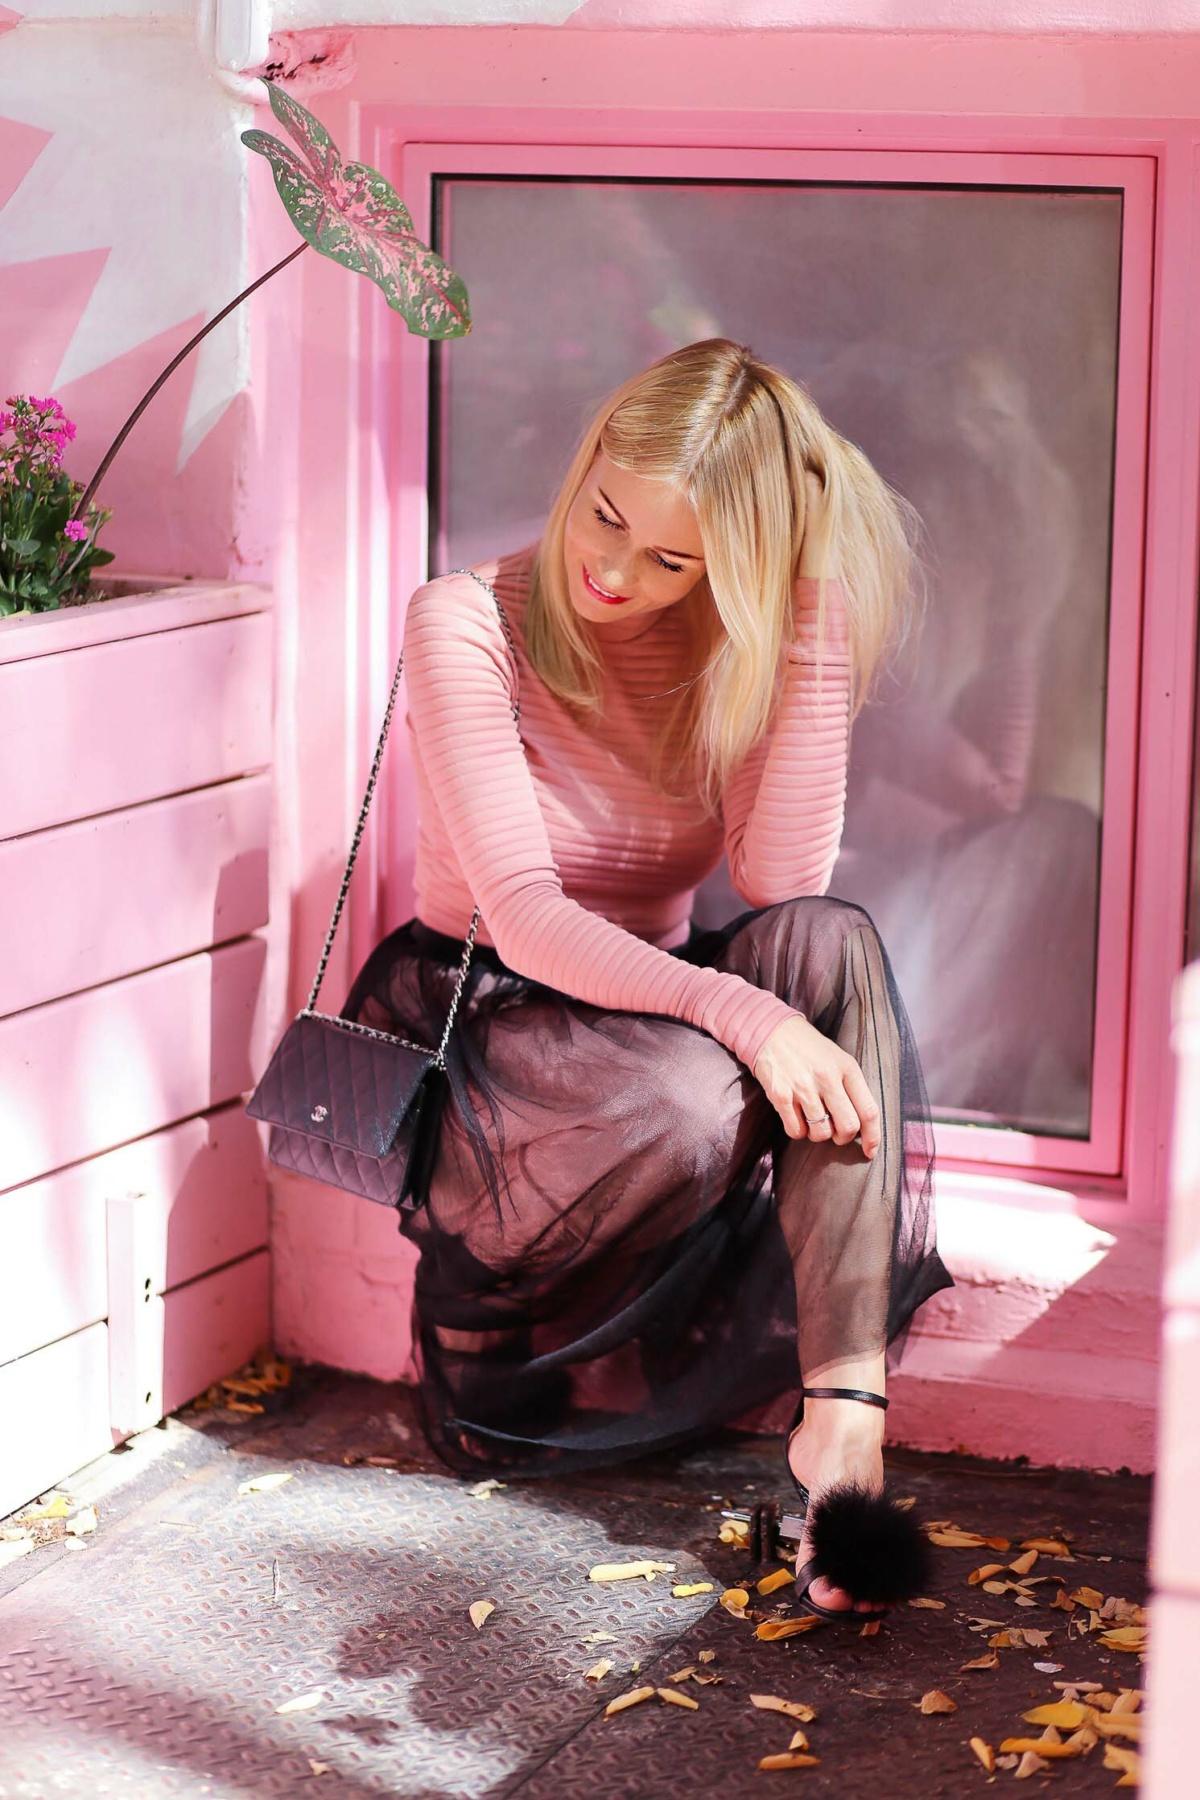 stylingliebe-fashionblog-muenchen-styleblog-munich-blogger-deutschland-fashionblogger-bloggerdeutschland-lifestyleblog-modeblog-germanblogger-carrie-bradshaw-look-nyc-streetstyle-1